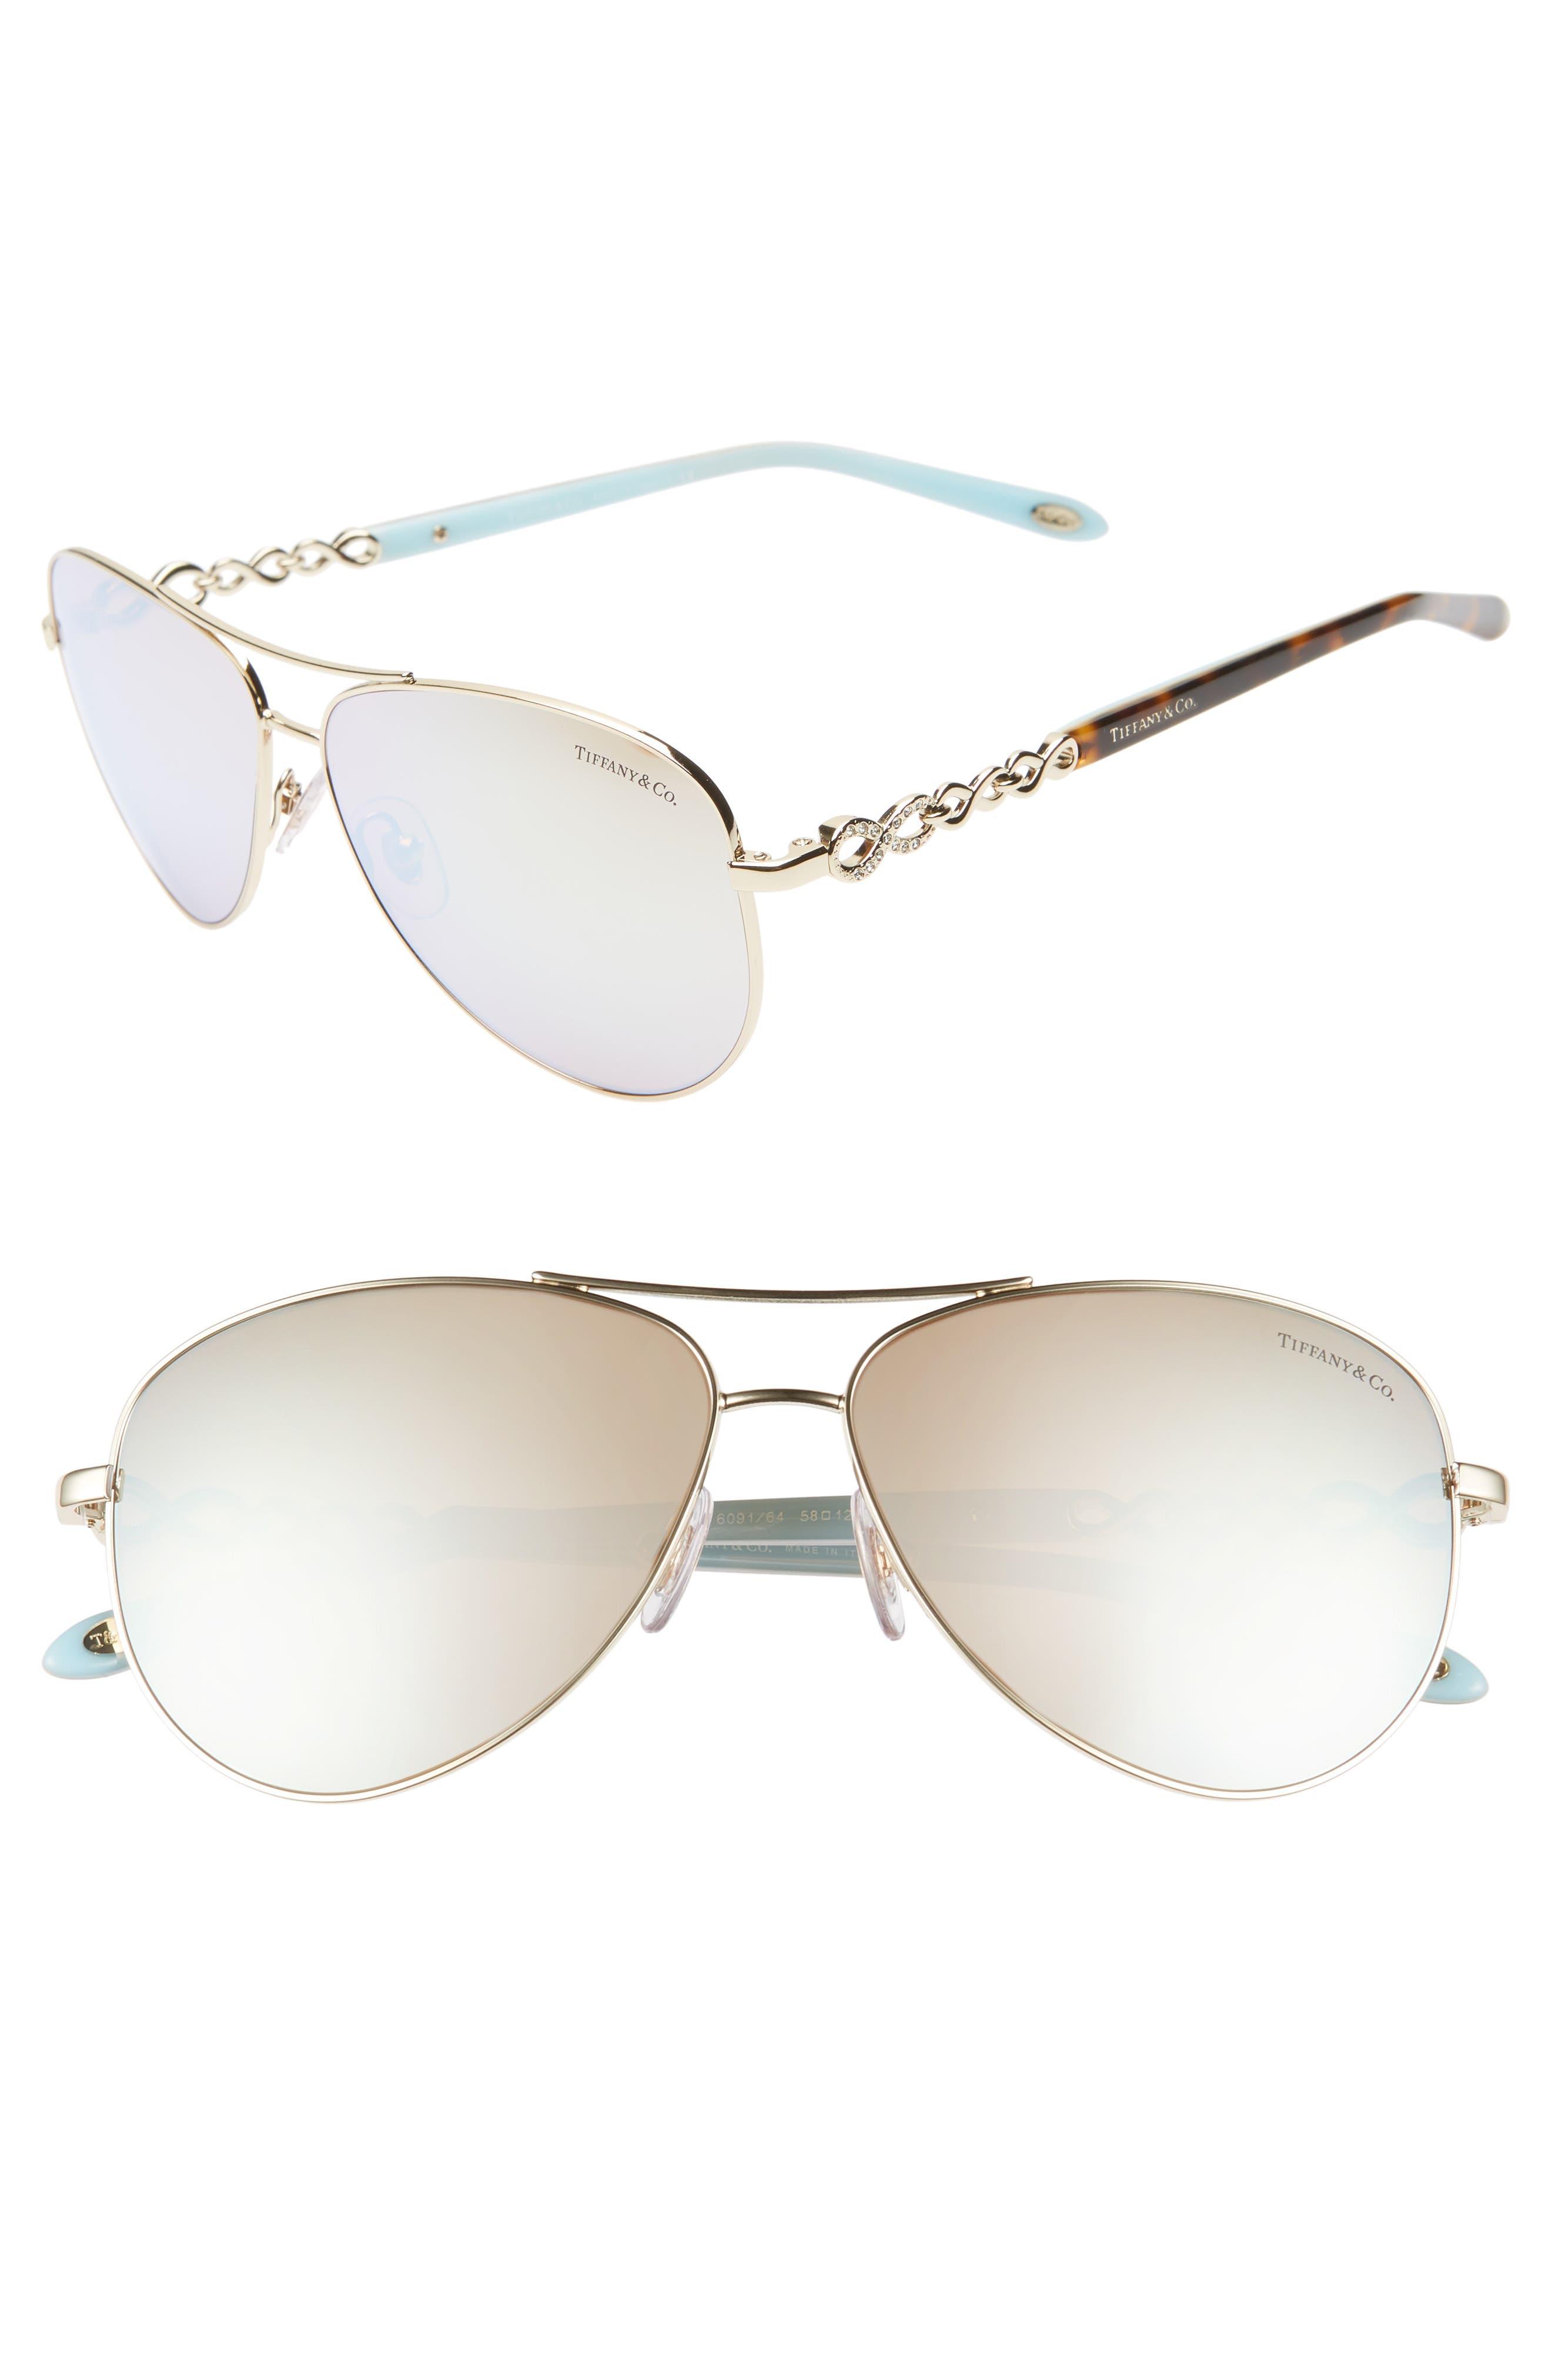 TIFFANY & CO., 58mm Aviator Sunglasses, Main thumbnail 1, color, GOLD/ WHITE MIRROR